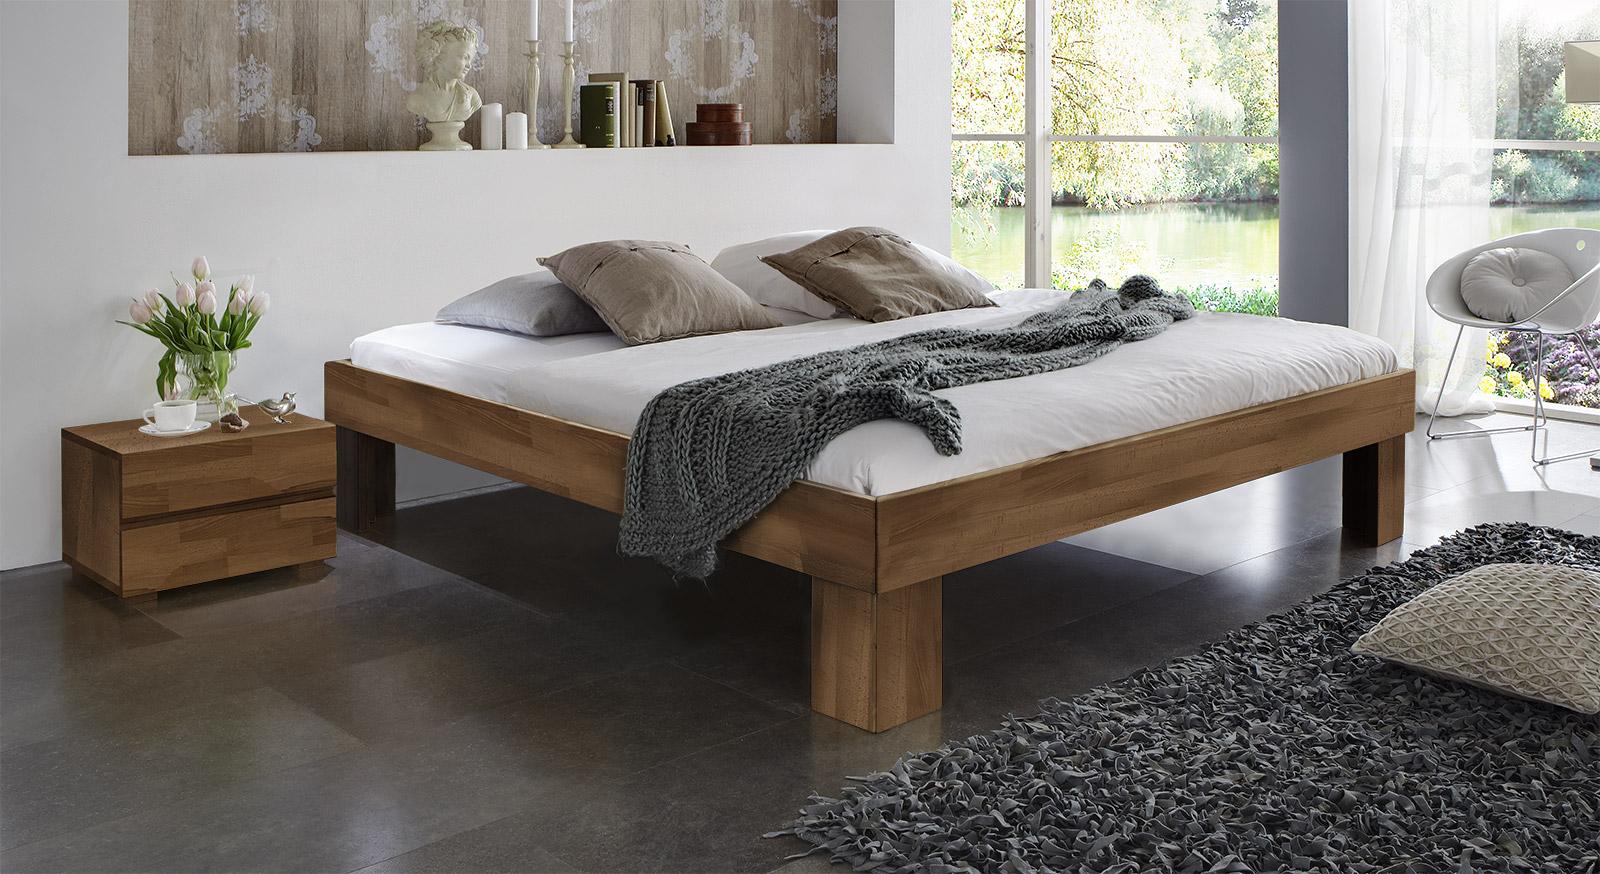 Betten In Komforthohe Komfortbetten Von Betten De